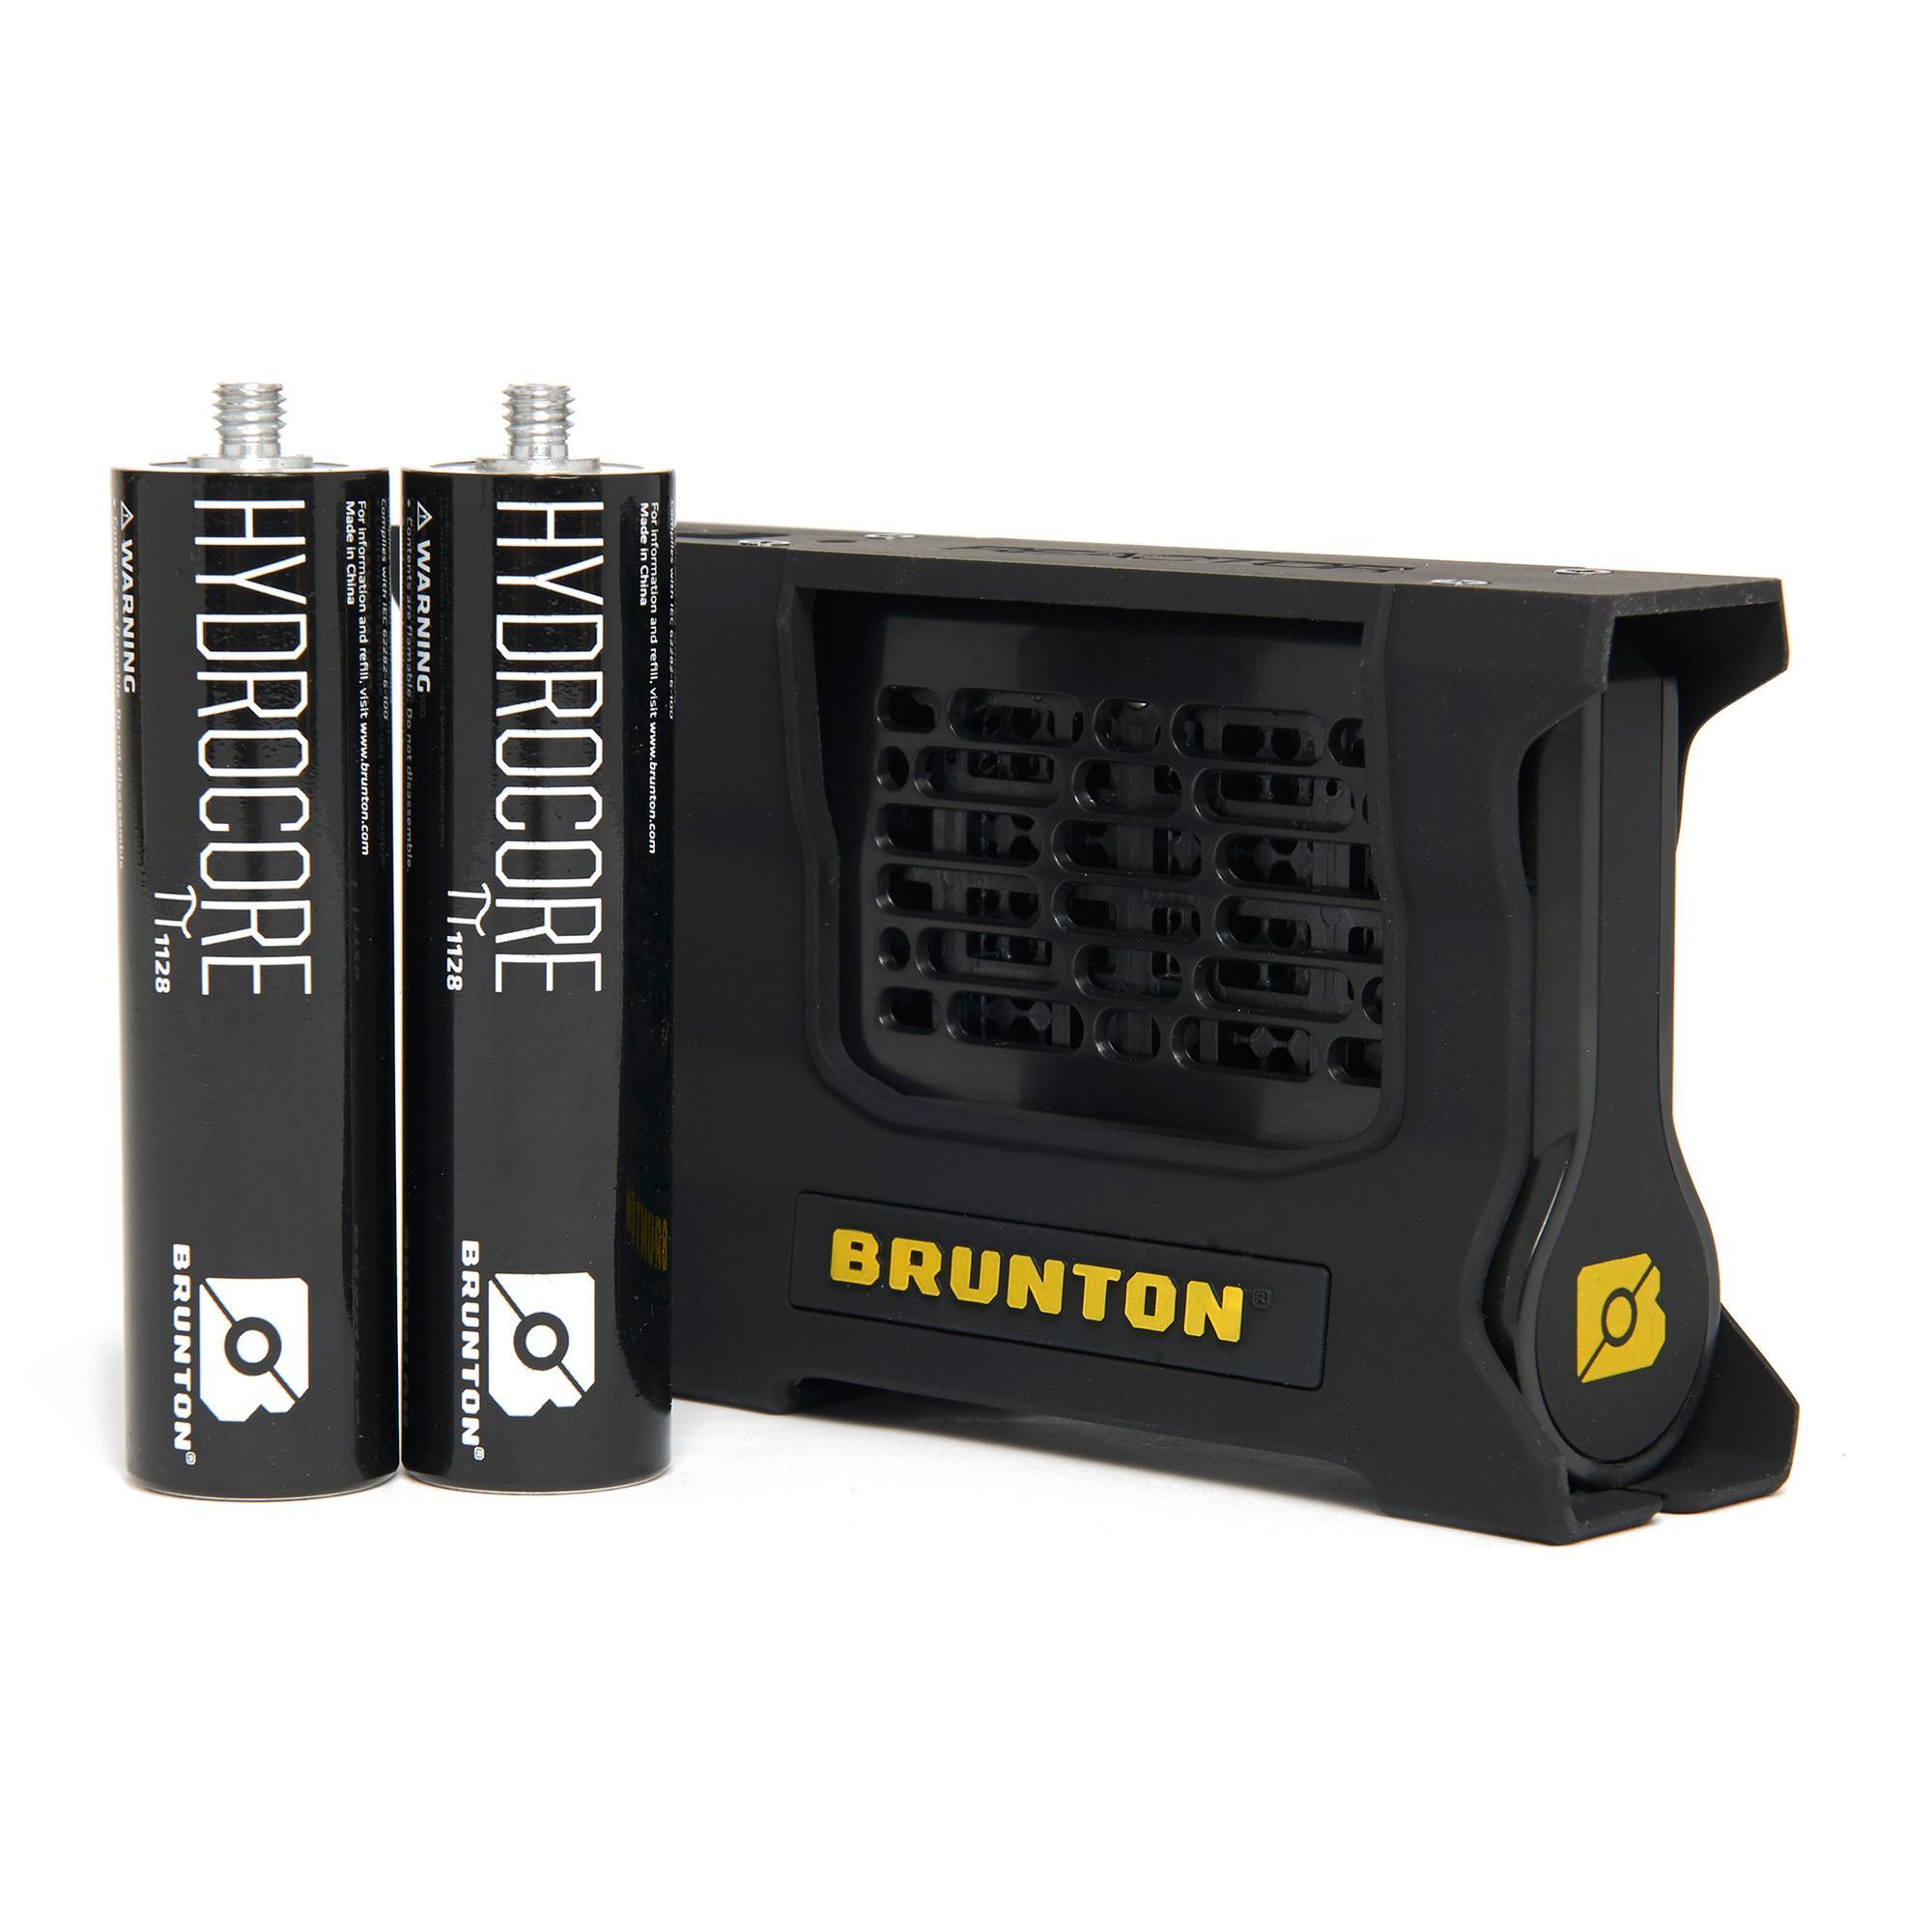 Brunton Hydrogen Reactor Portable Charger - Black, Black